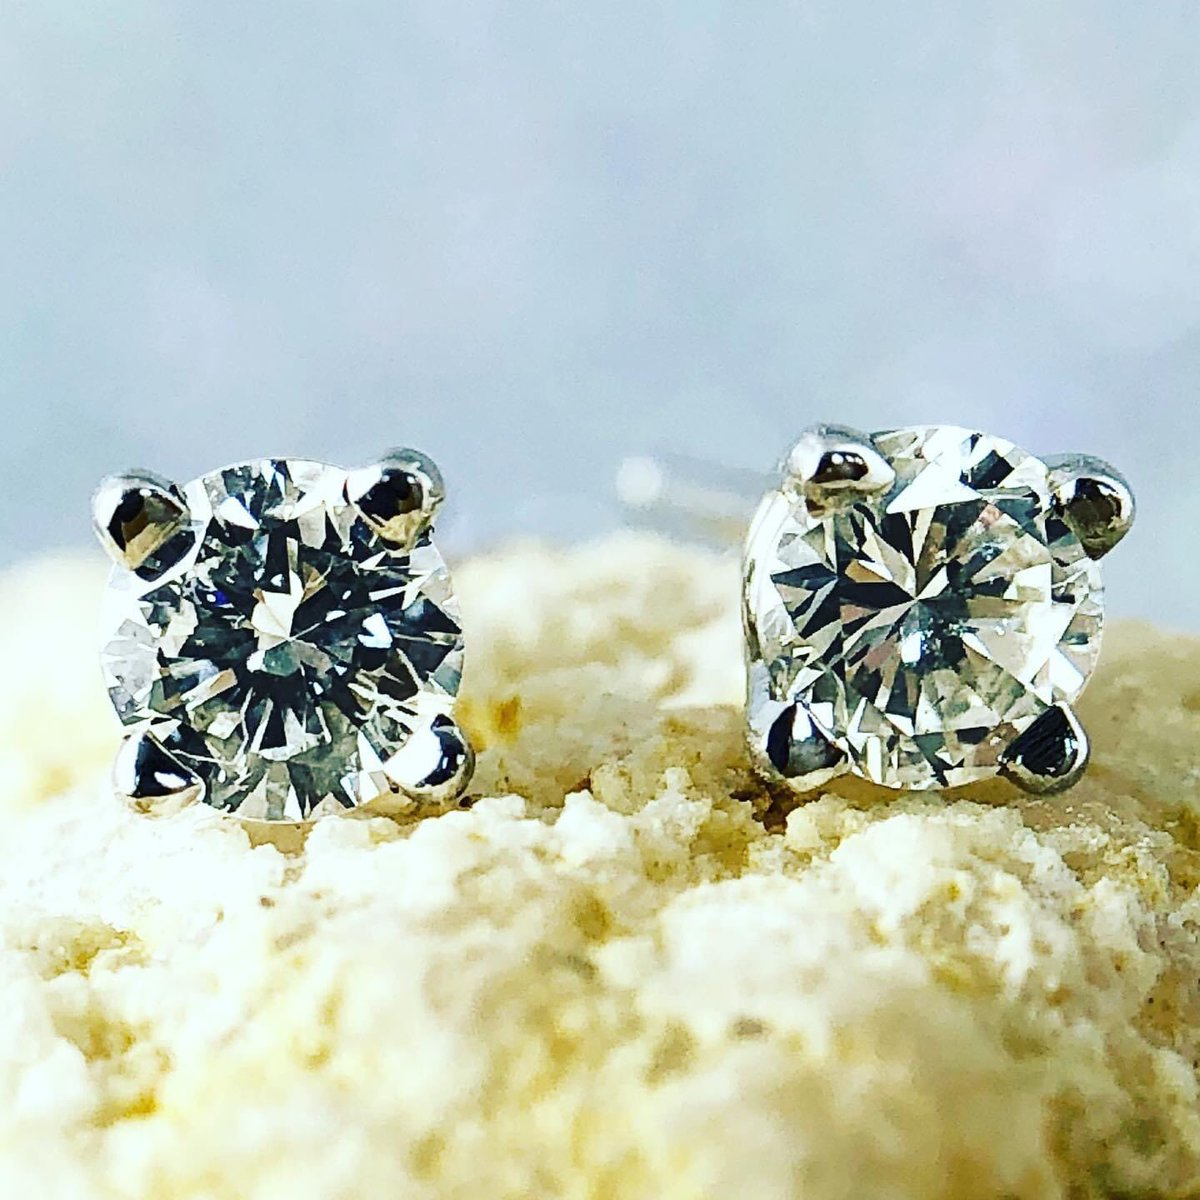 #April babies are so #lucky (#nofoolin). #Diamonds are their #birthstone. They are a symbol of #love and inner #strength. #JimmyTheJeweler #BataviasBestJeweler #BataviaNY #diamondsareagirlsbestfriend #bling #sparklepic.twitter.com/dXlUTF06UO